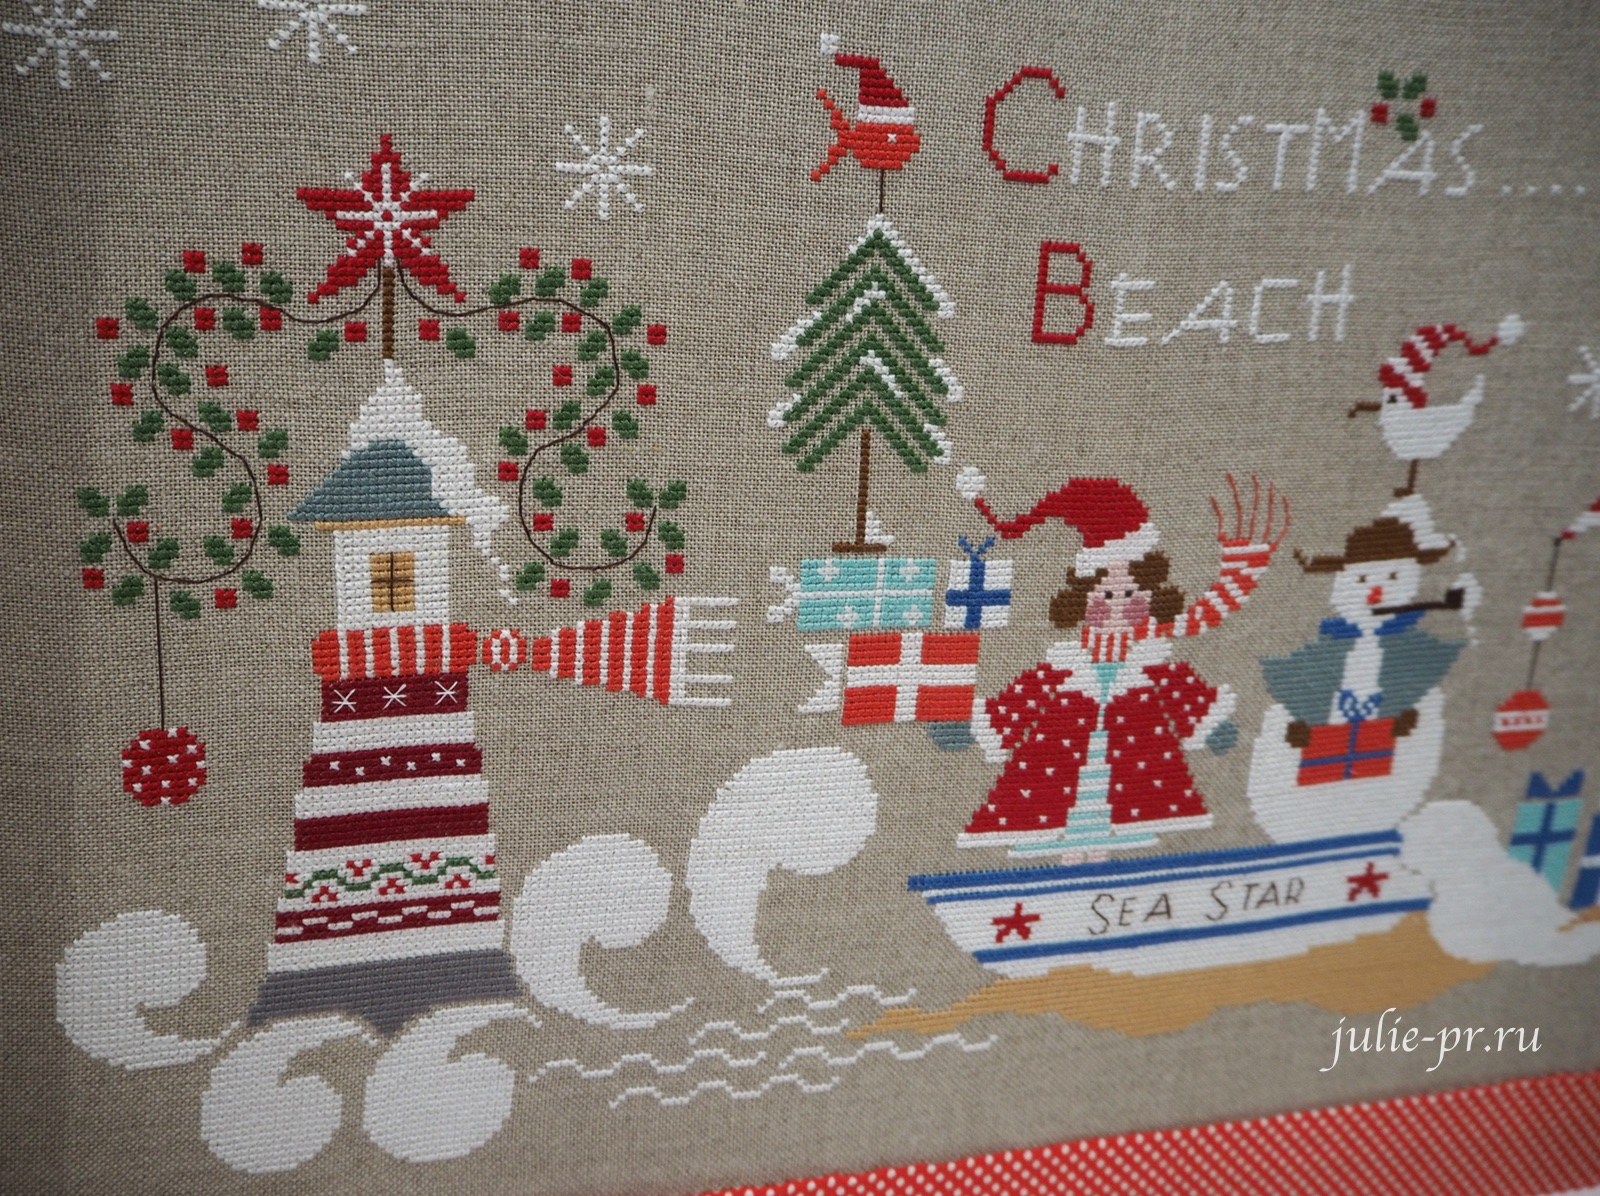 Cuore e batticuore, Christmas on the Beach, Рождество на пляже, вышивка крестом